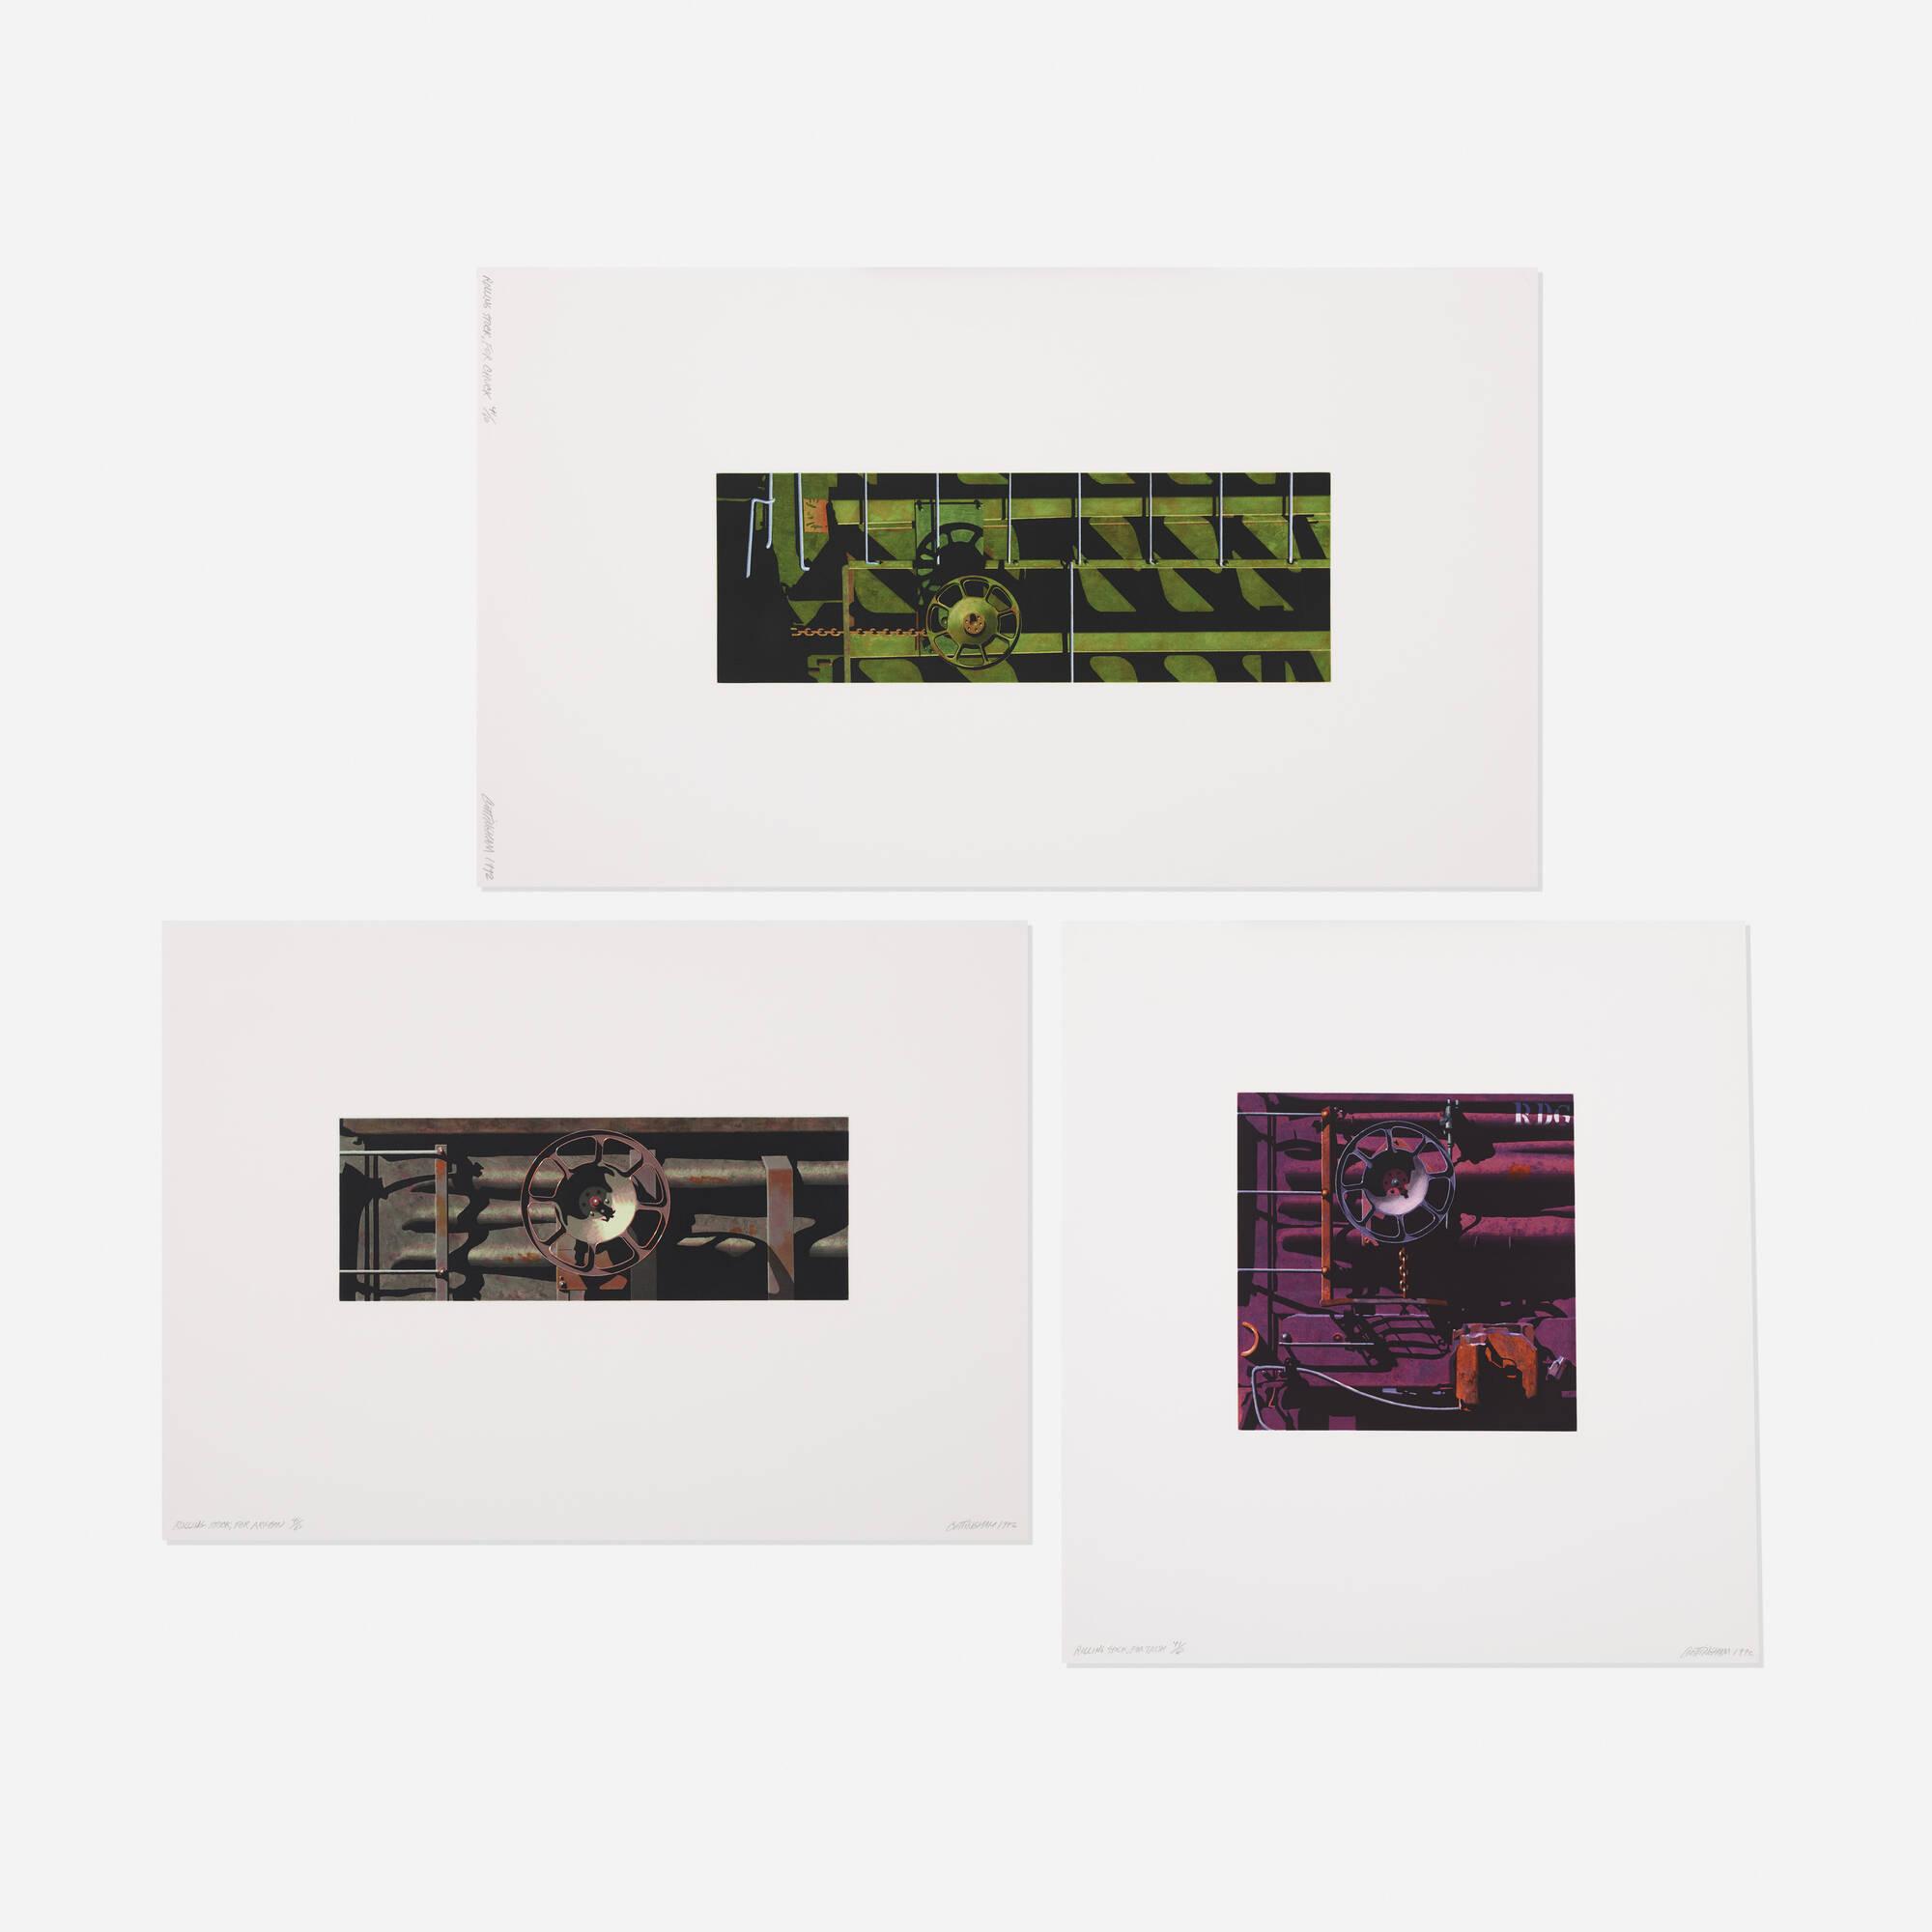 263: Robert Cottingham / Rolling Stock (three works) (1 of 1)